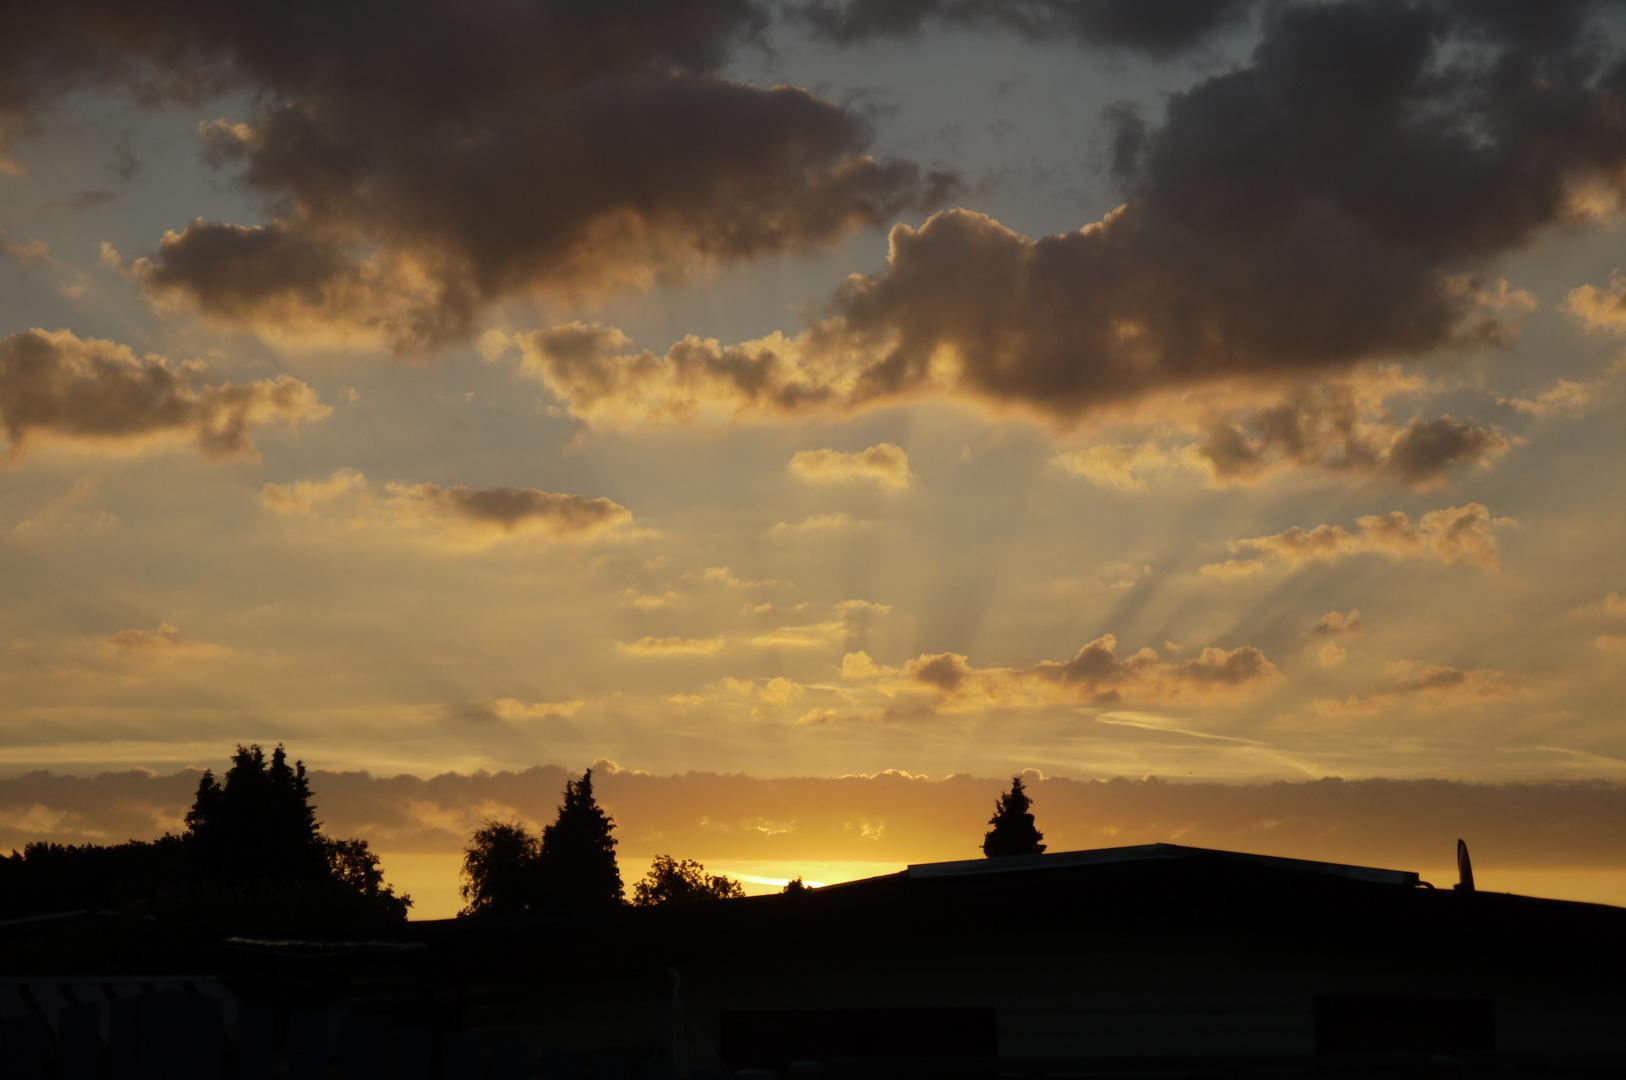 Sonnenaufgang 6:25 Uhr